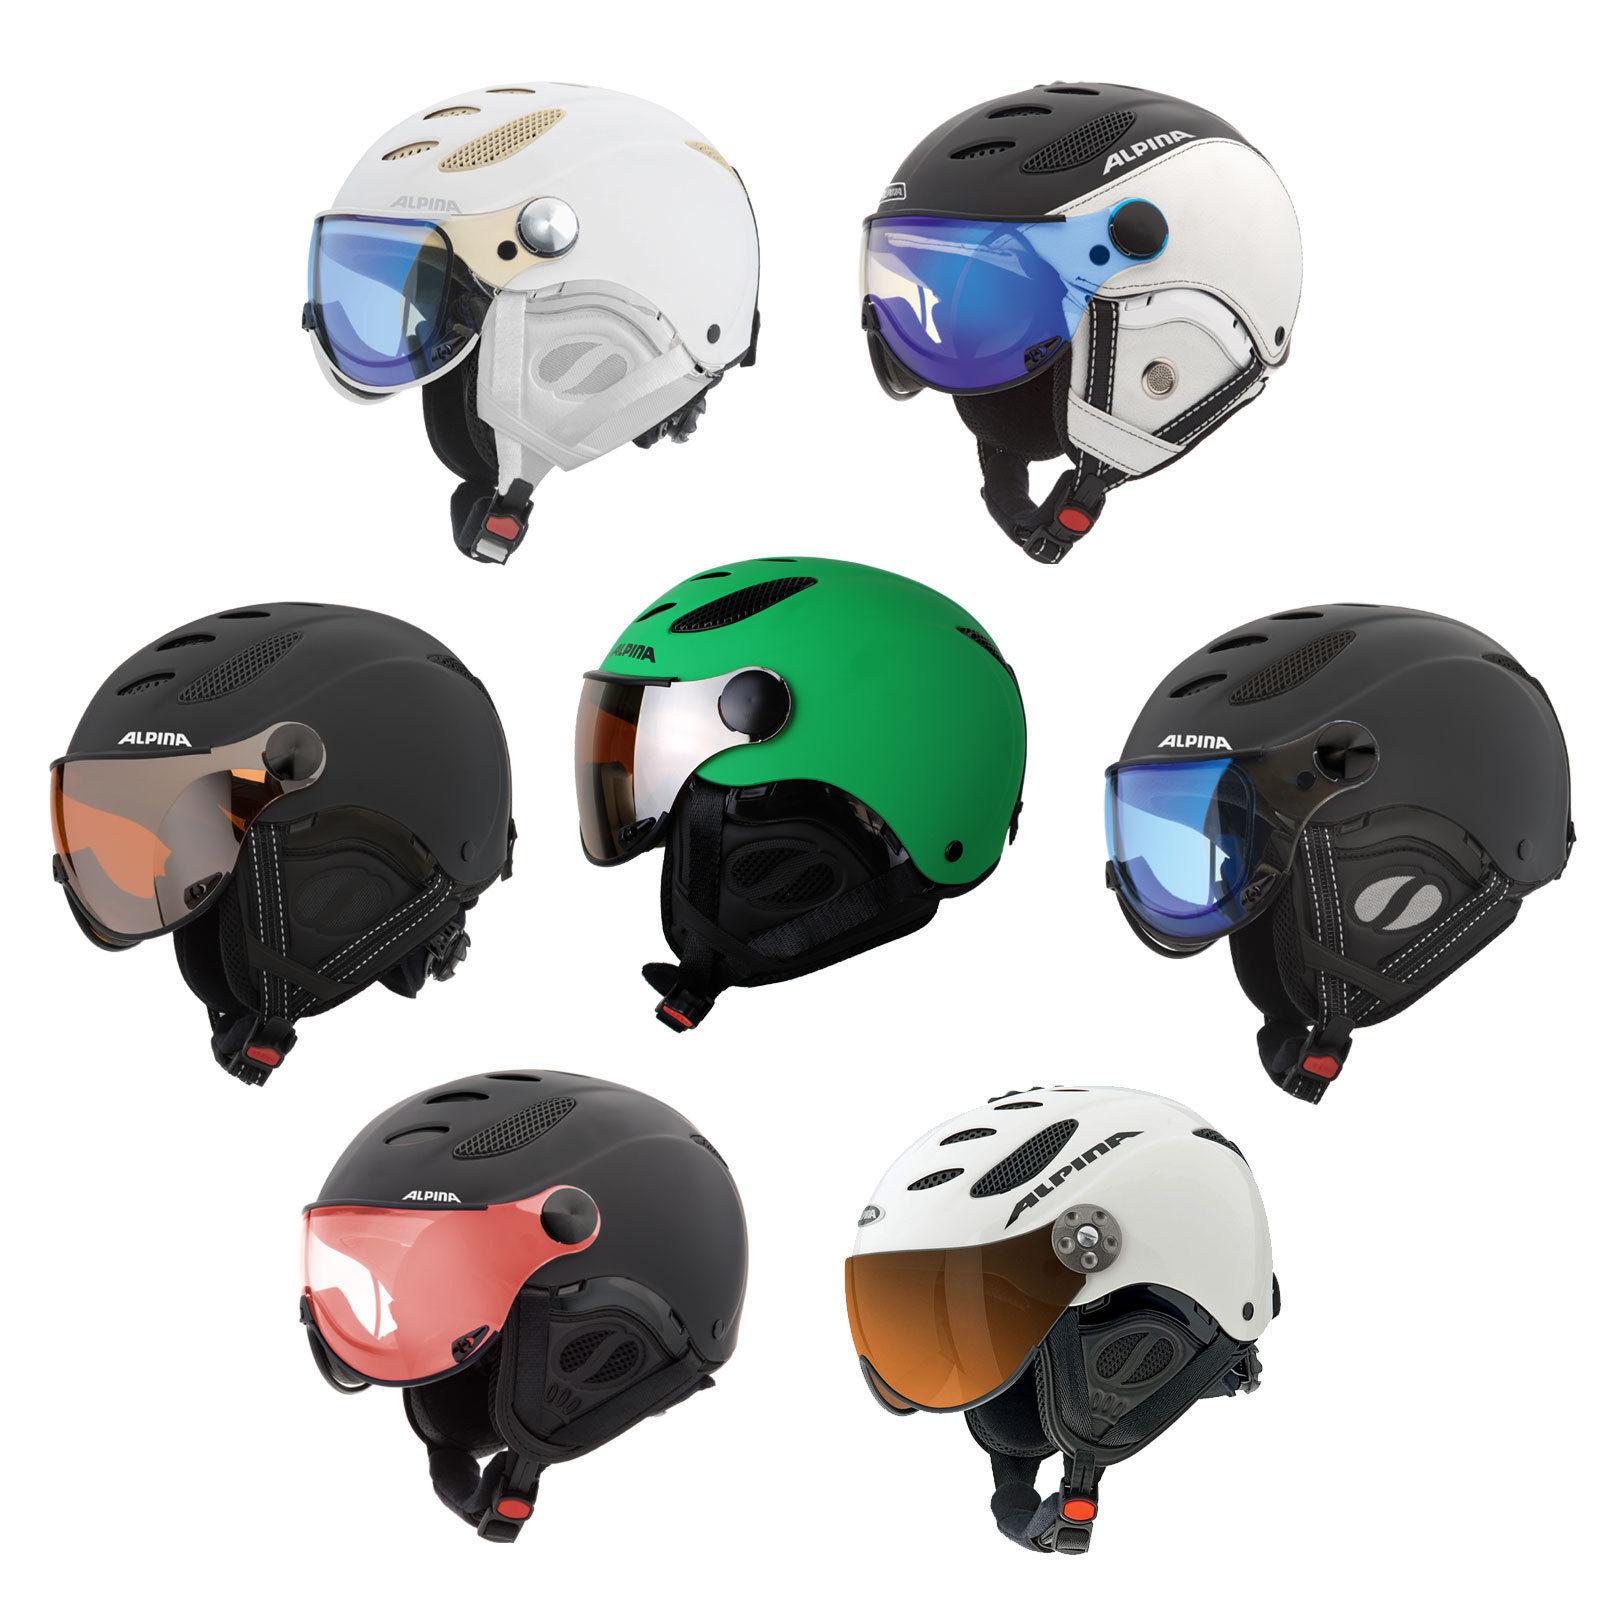 Alpina Jump JV Visor Ski Snowboard Helmet Visor Helmet, Quattroflex Varioflex